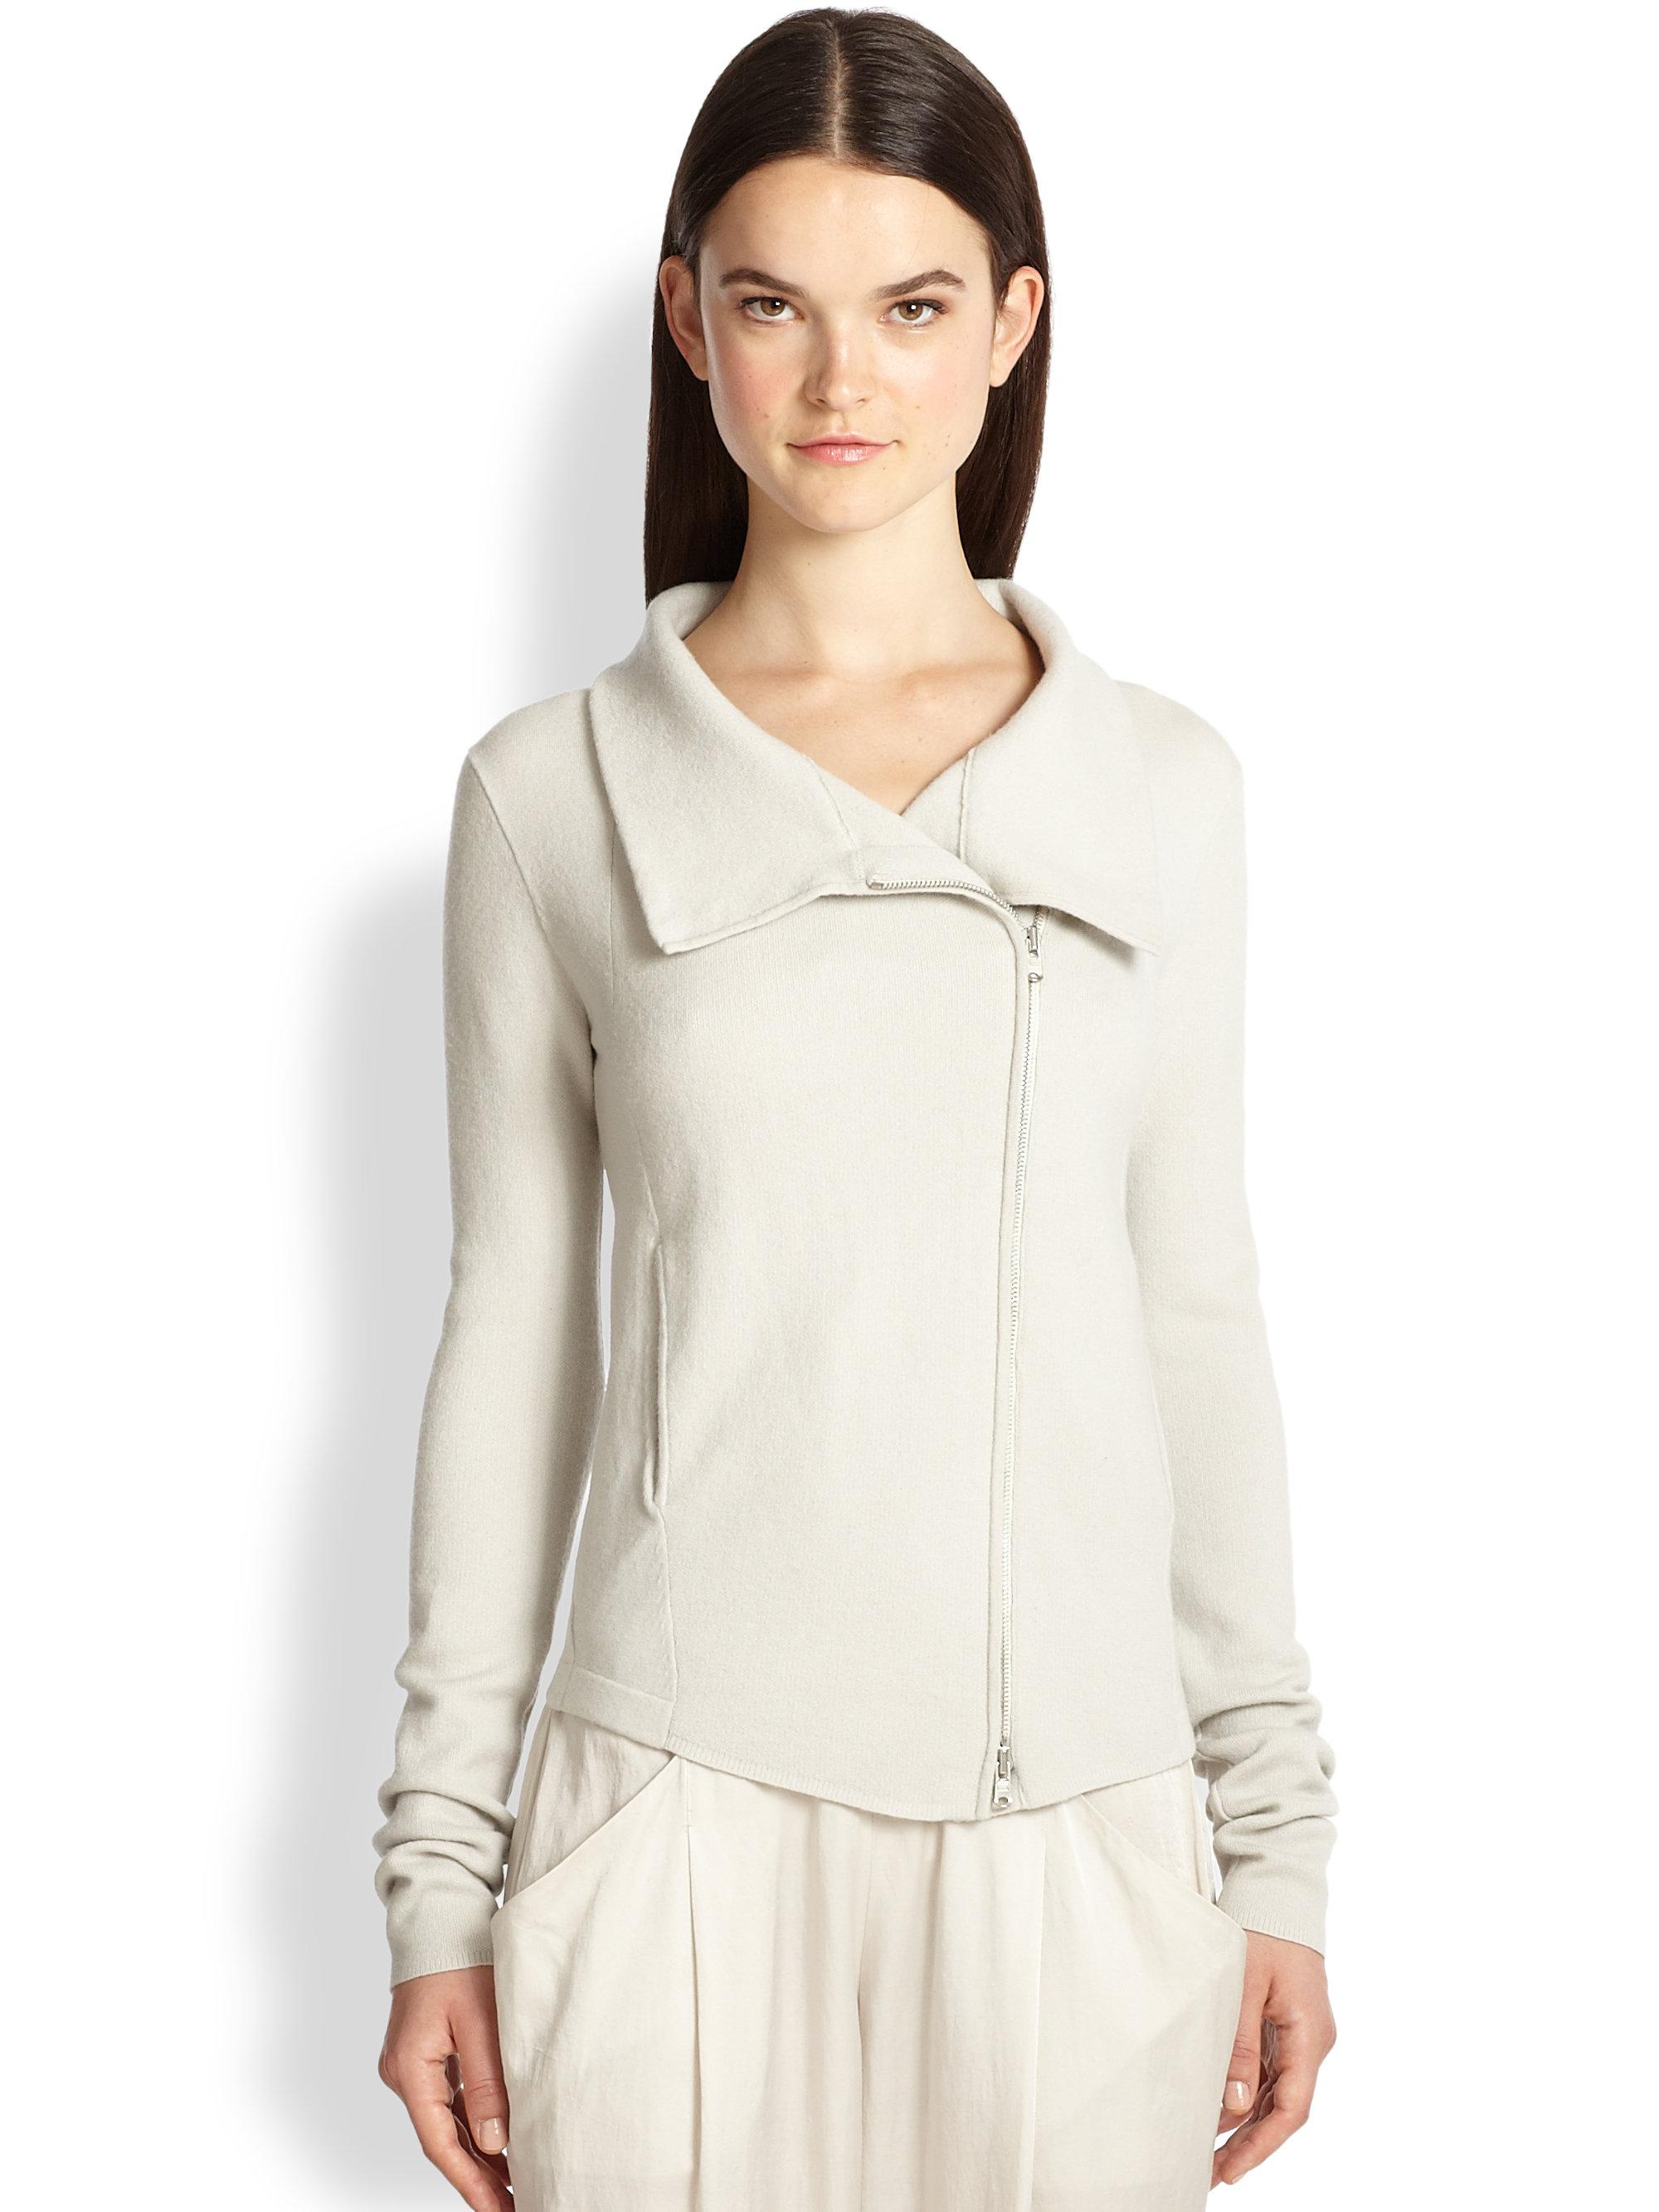 lyst donna karan stretch cashmere zipper cardigan in white. Black Bedroom Furniture Sets. Home Design Ideas